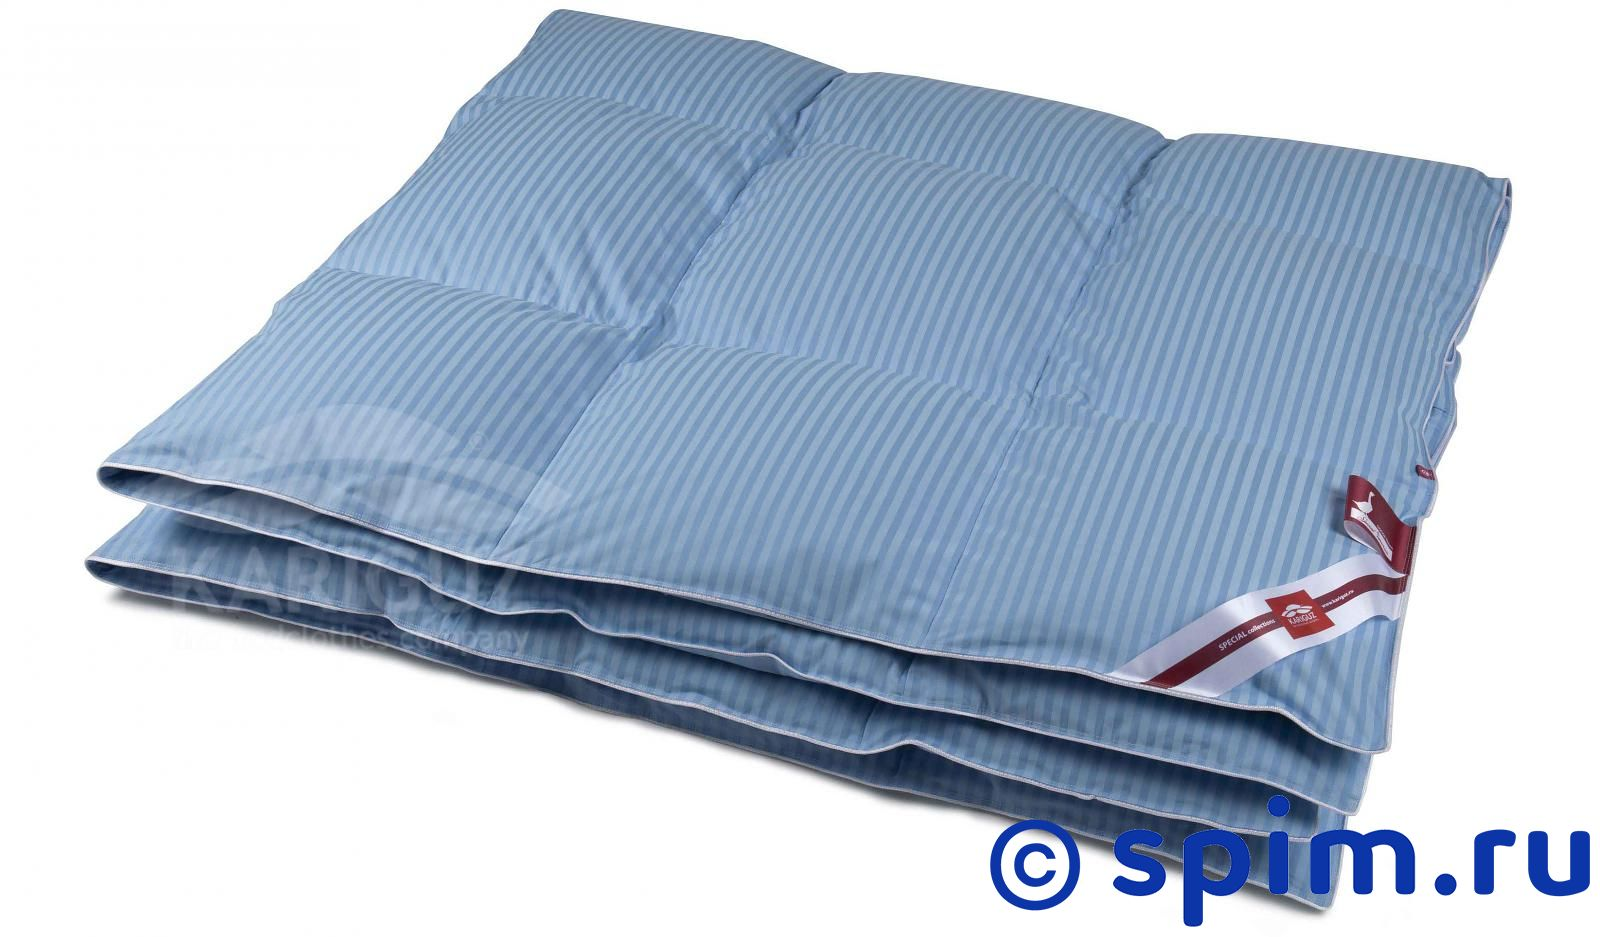 Купить Одеяло Kariguz Classic, зимнее 140х205 см